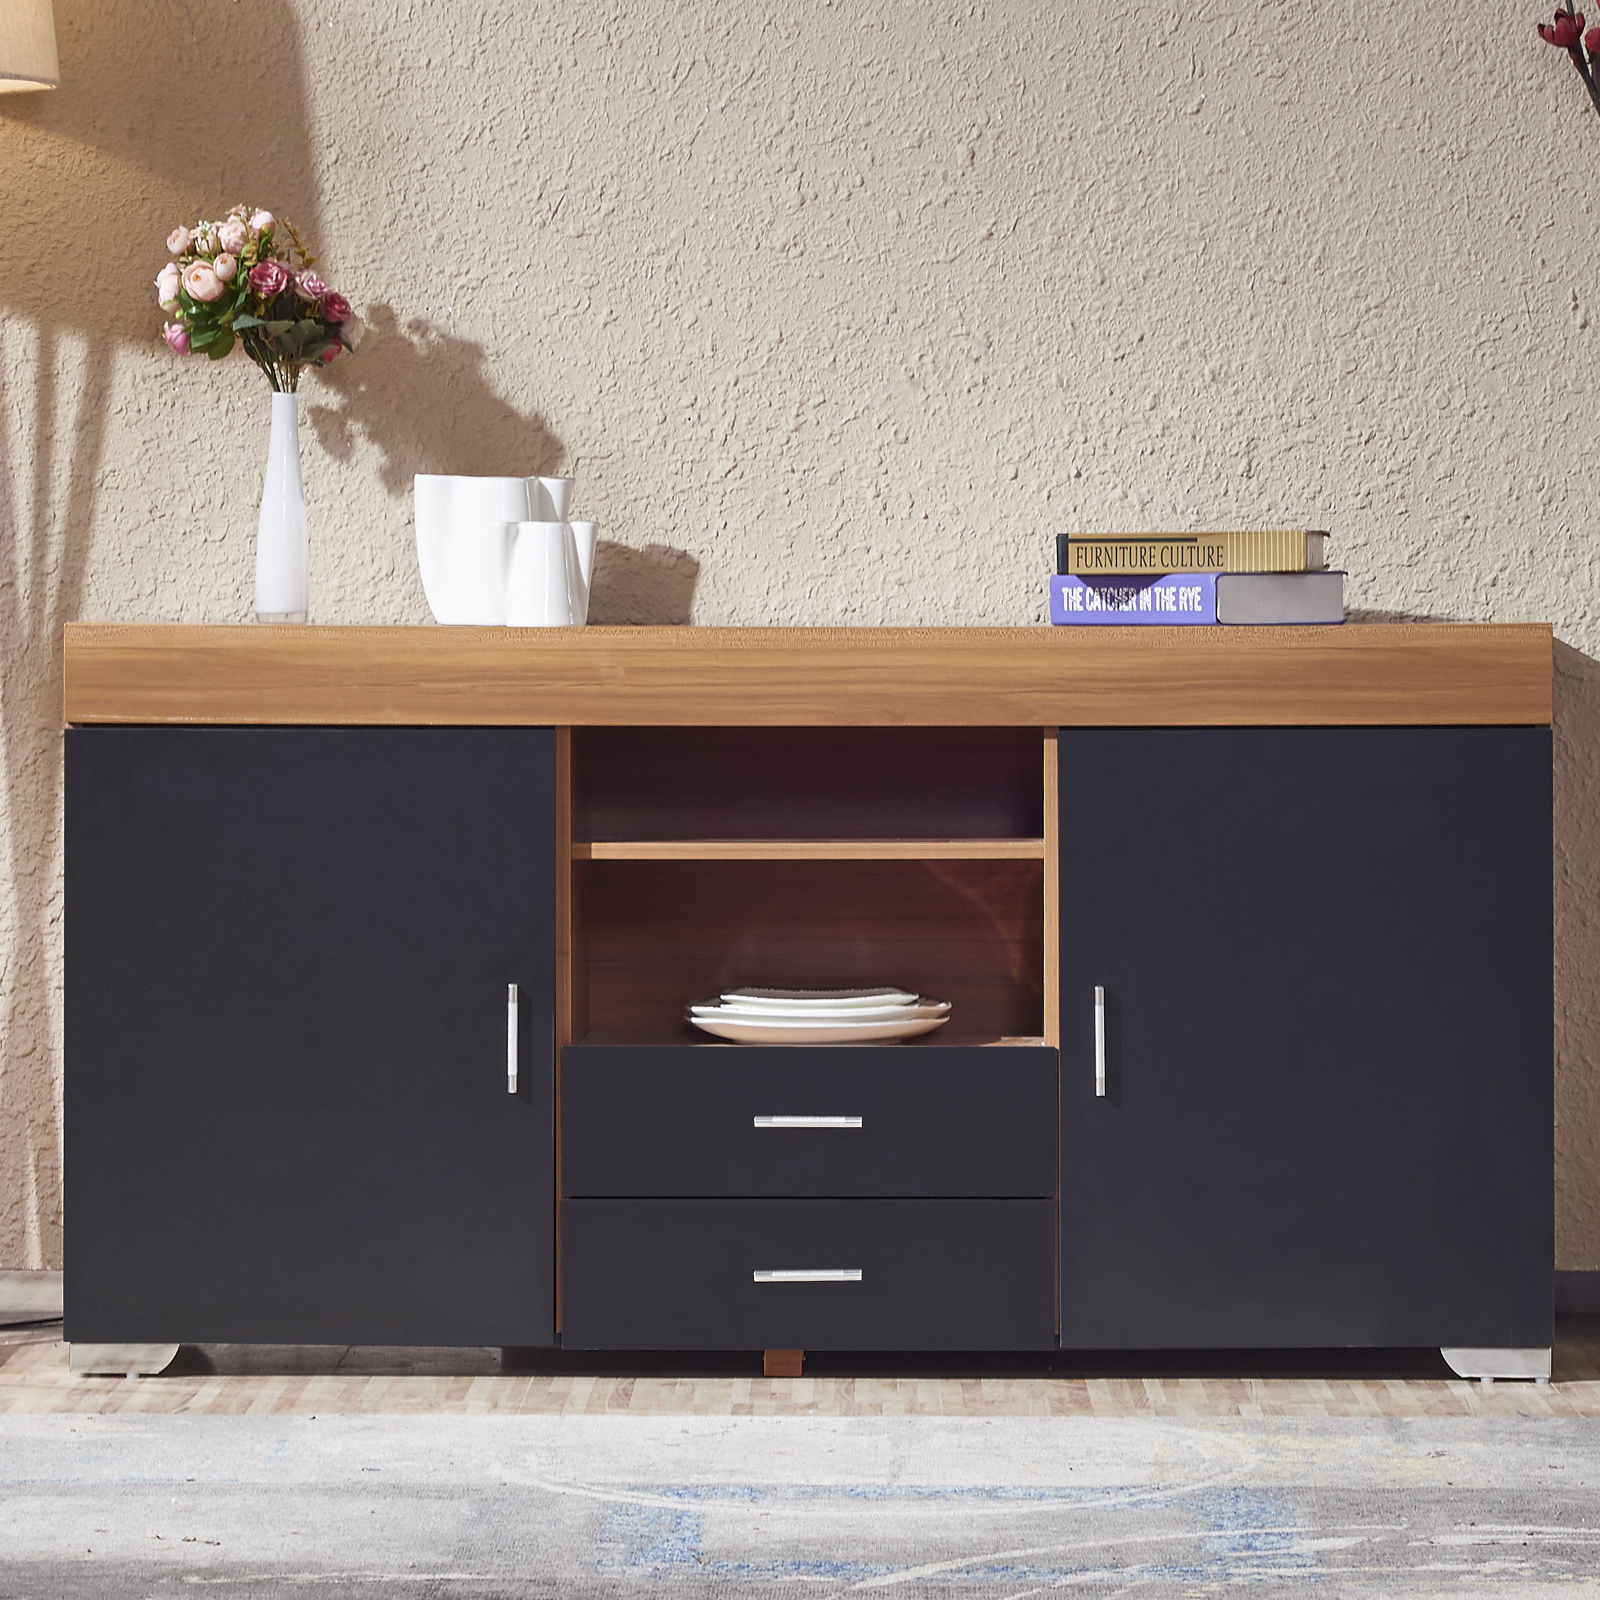 2 Doors 2 Drawers TV Stand Sideboard Cupboard TV Cabinet Unit Walnut Black   -> Walnut Tv Sideboard